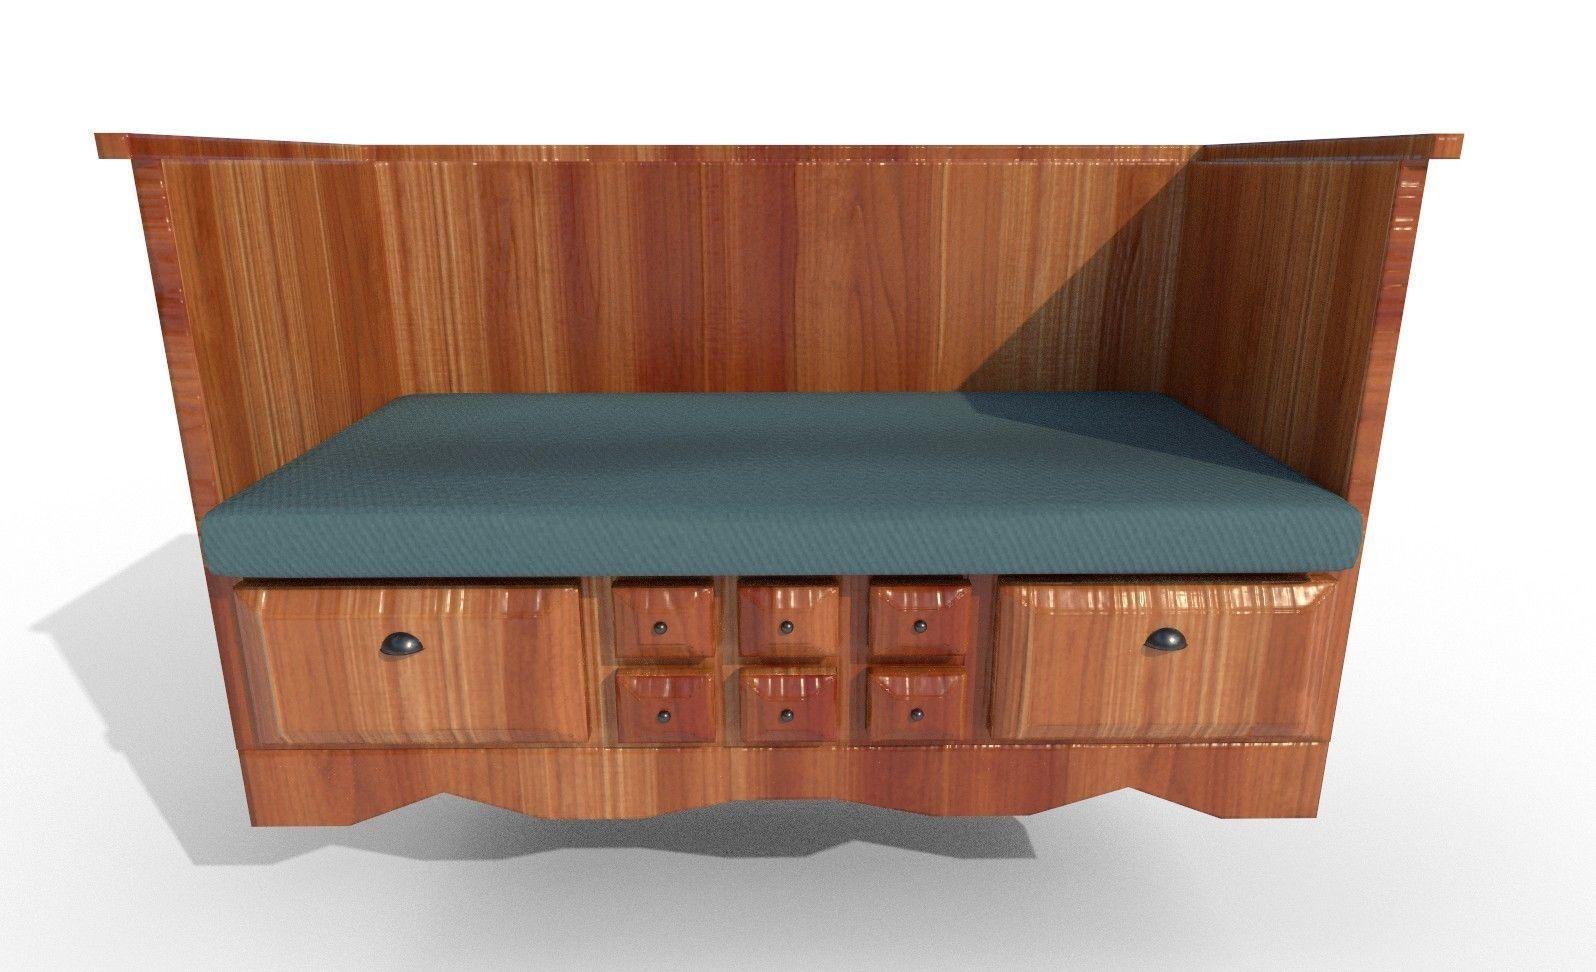 Bench wood 3D model OBJ FBX